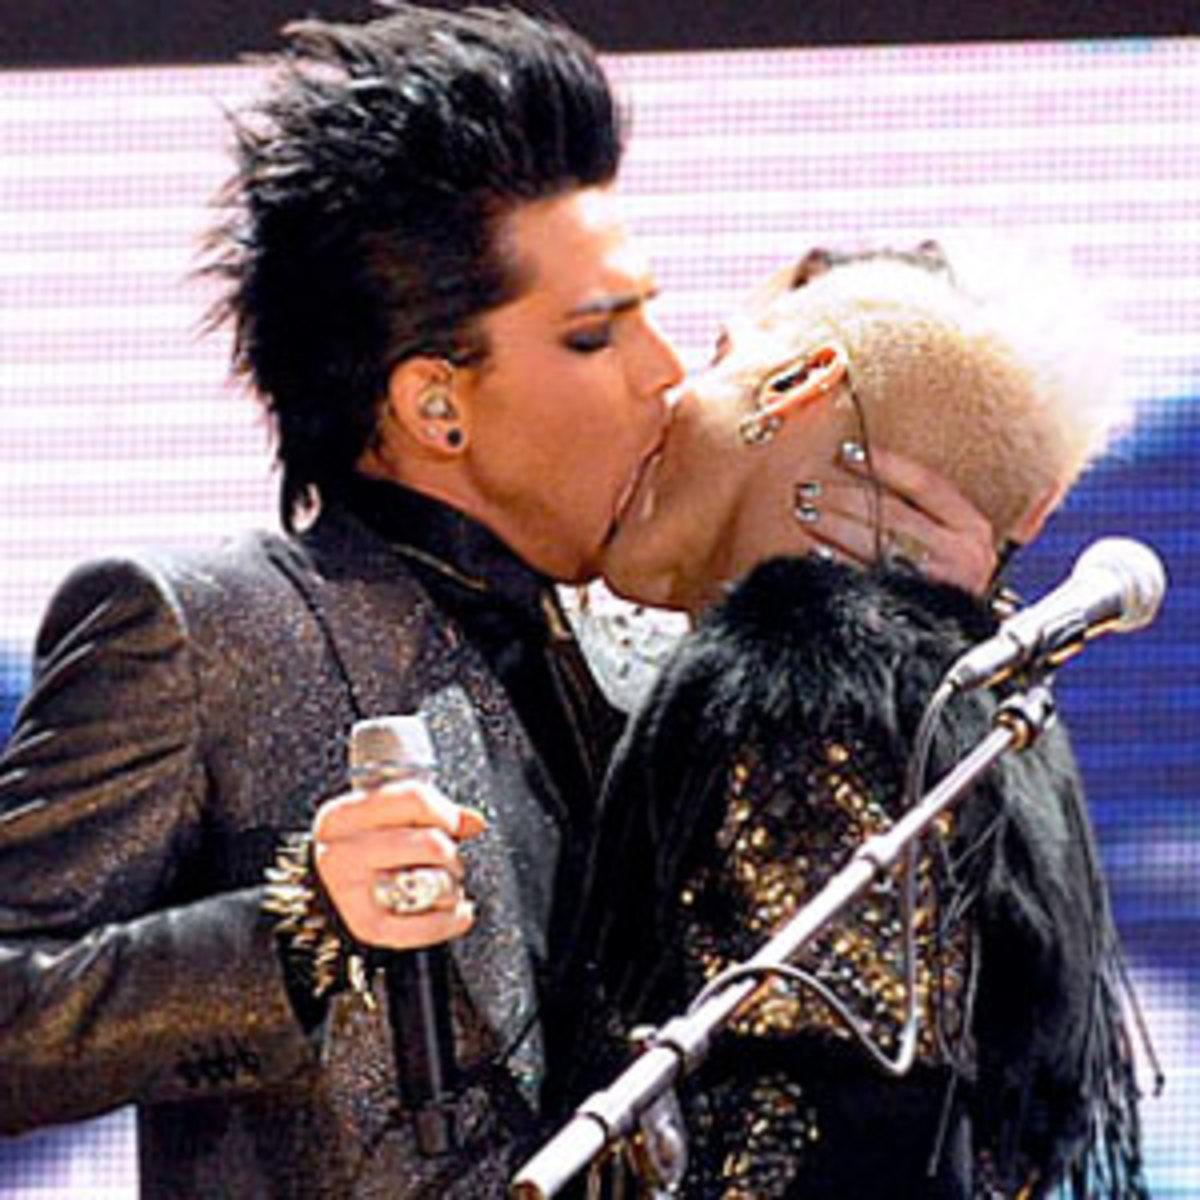 Adam Lambert kissing another male